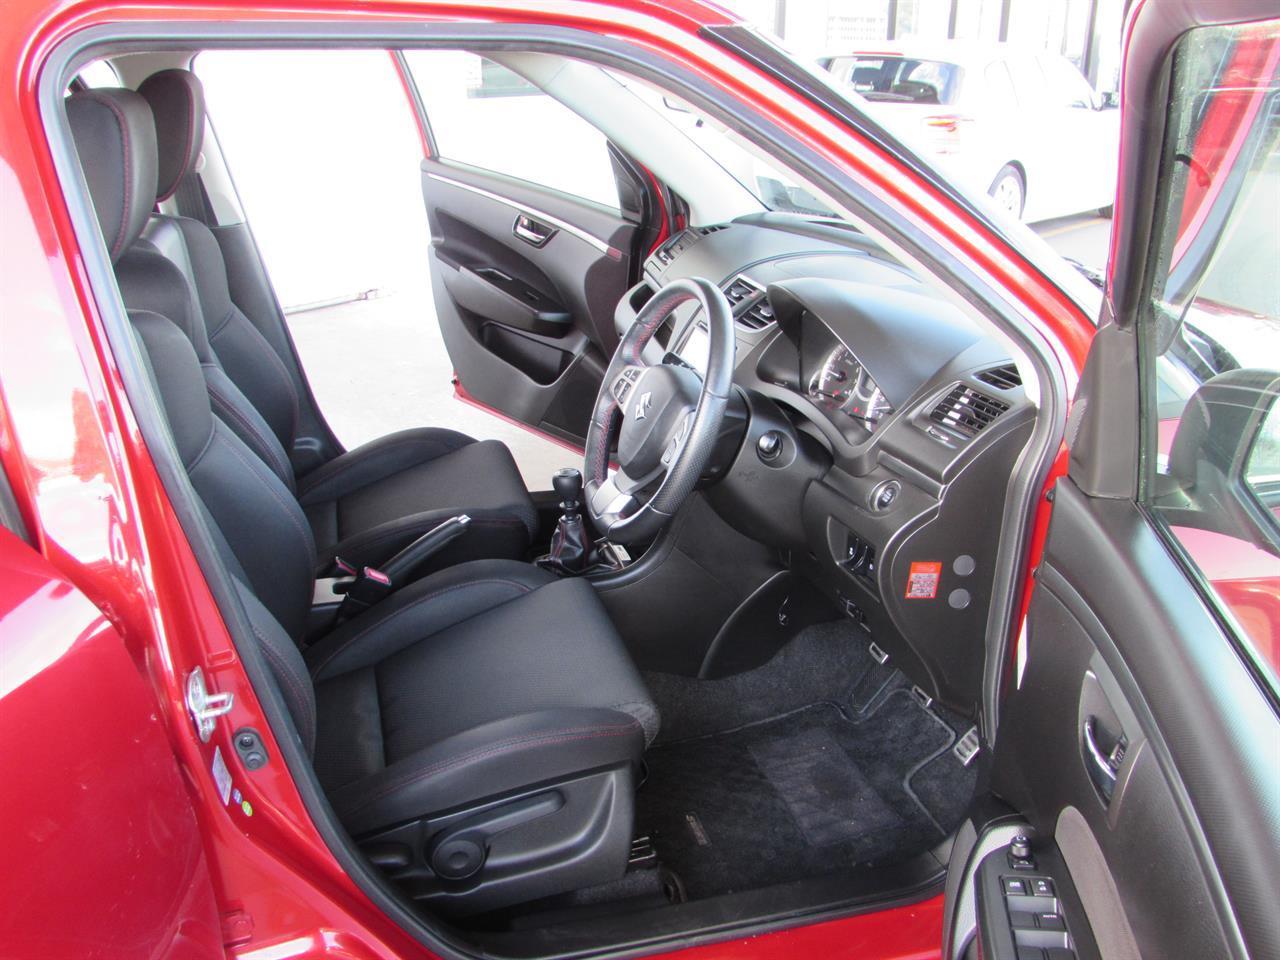 image-6, 2014 Suzuki SWIFT SPORTS at Christchurch